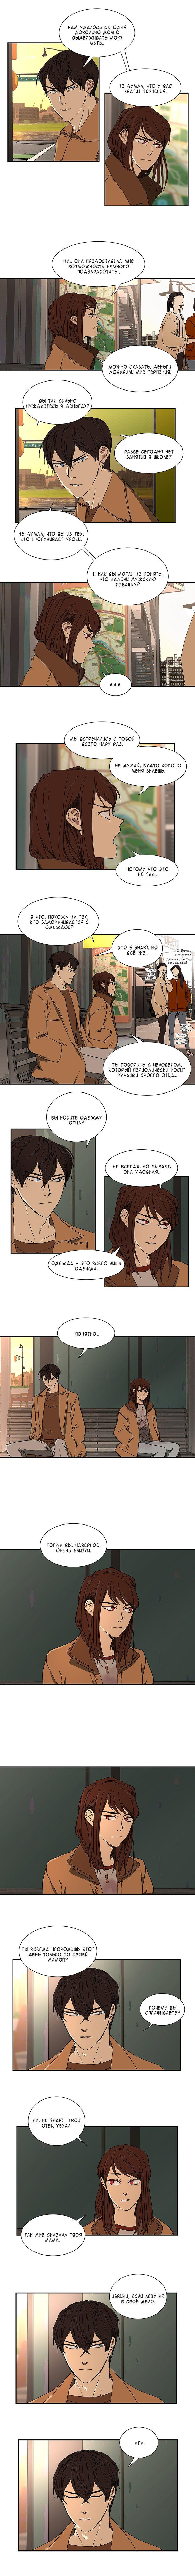 Манга Я люблю Ю / I love Yoo  - Том 1 Глава 41 Страница 5